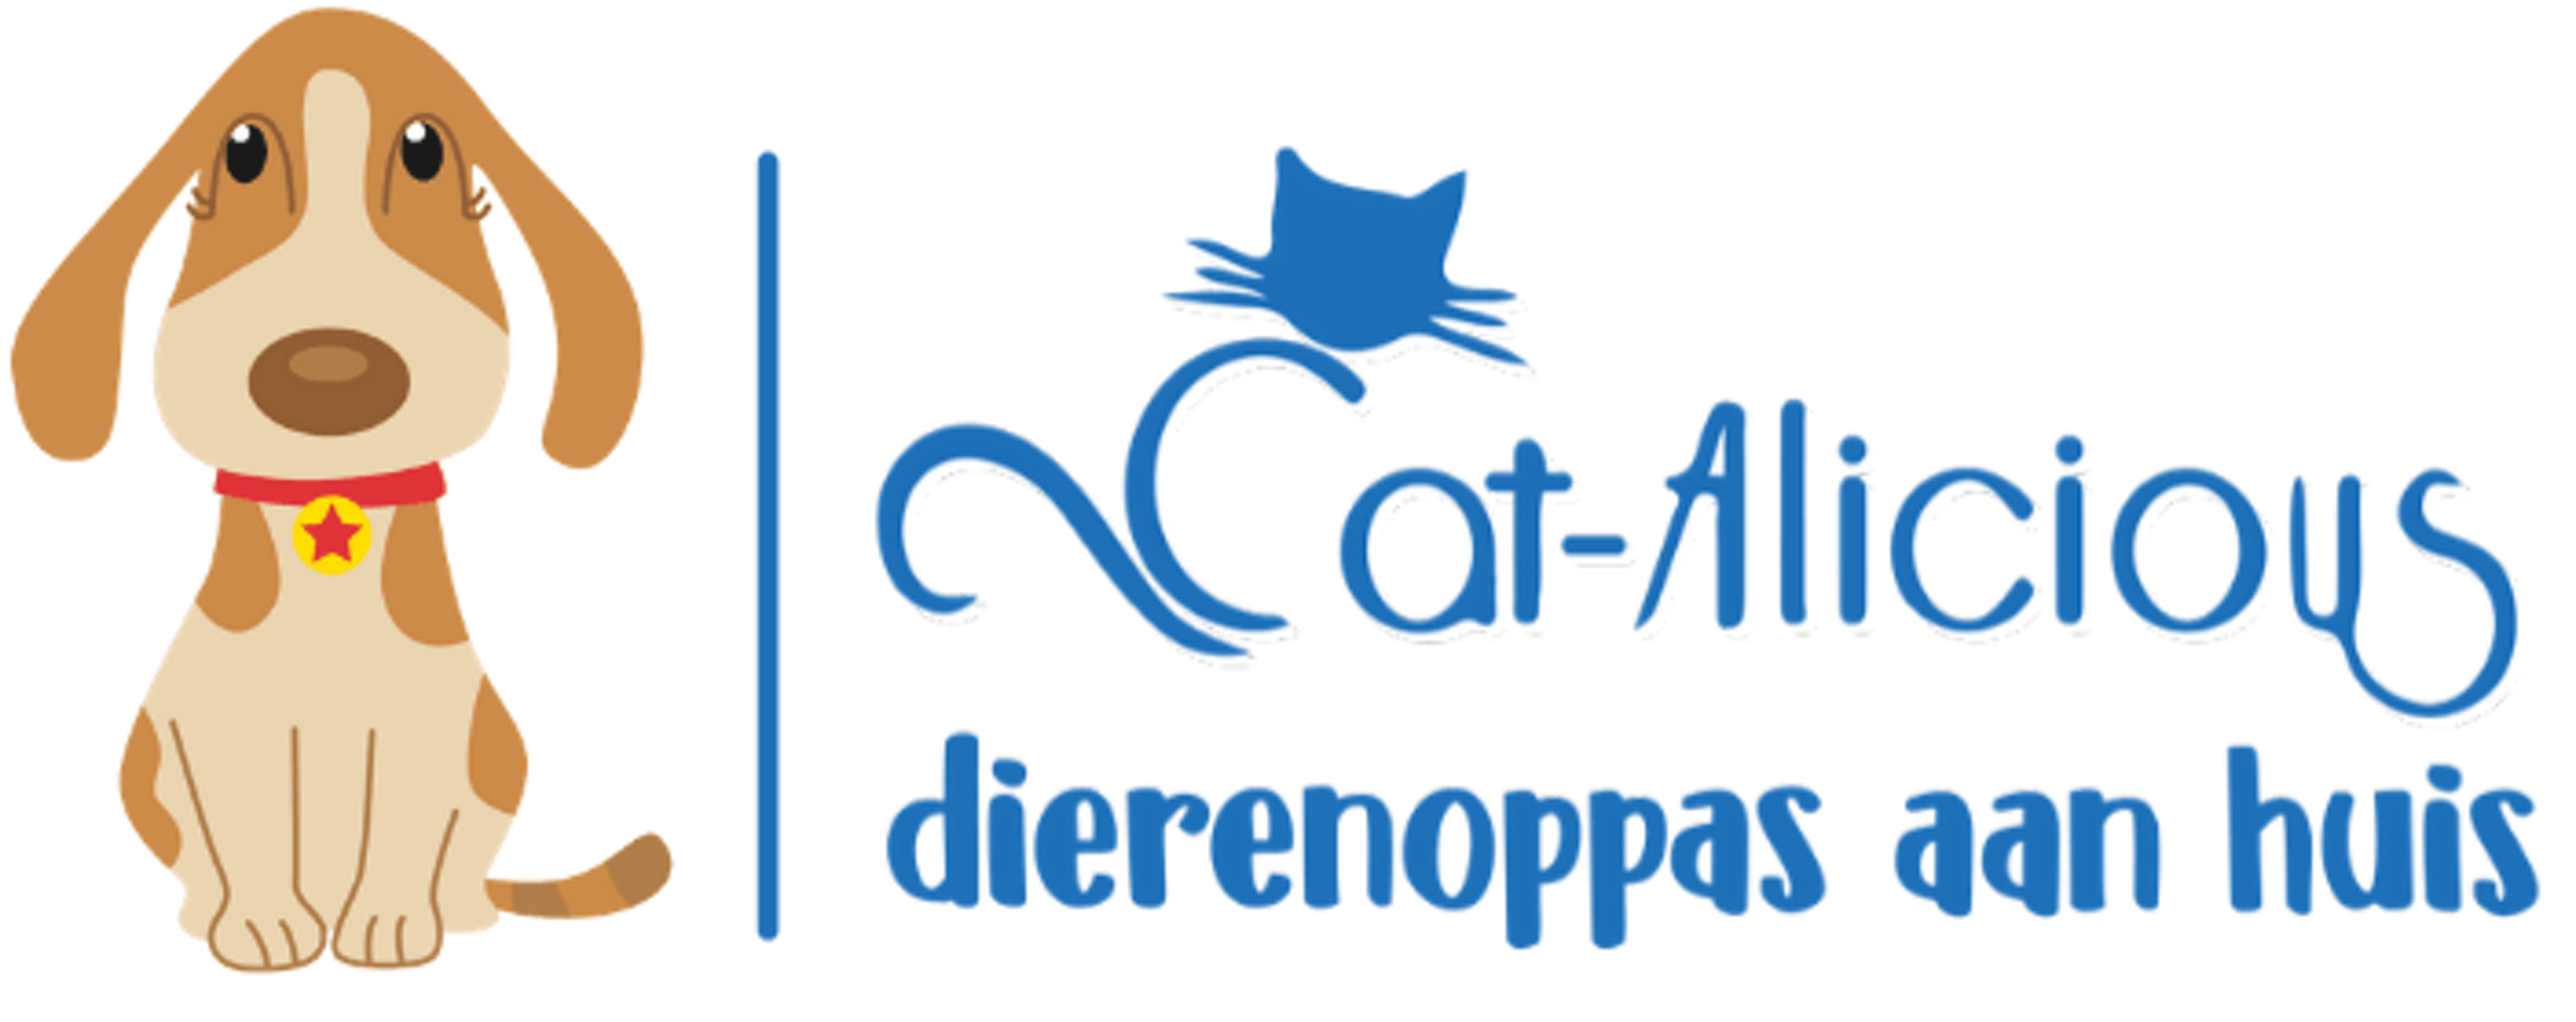 Cat-Alicious dierenoppas aan huis logo